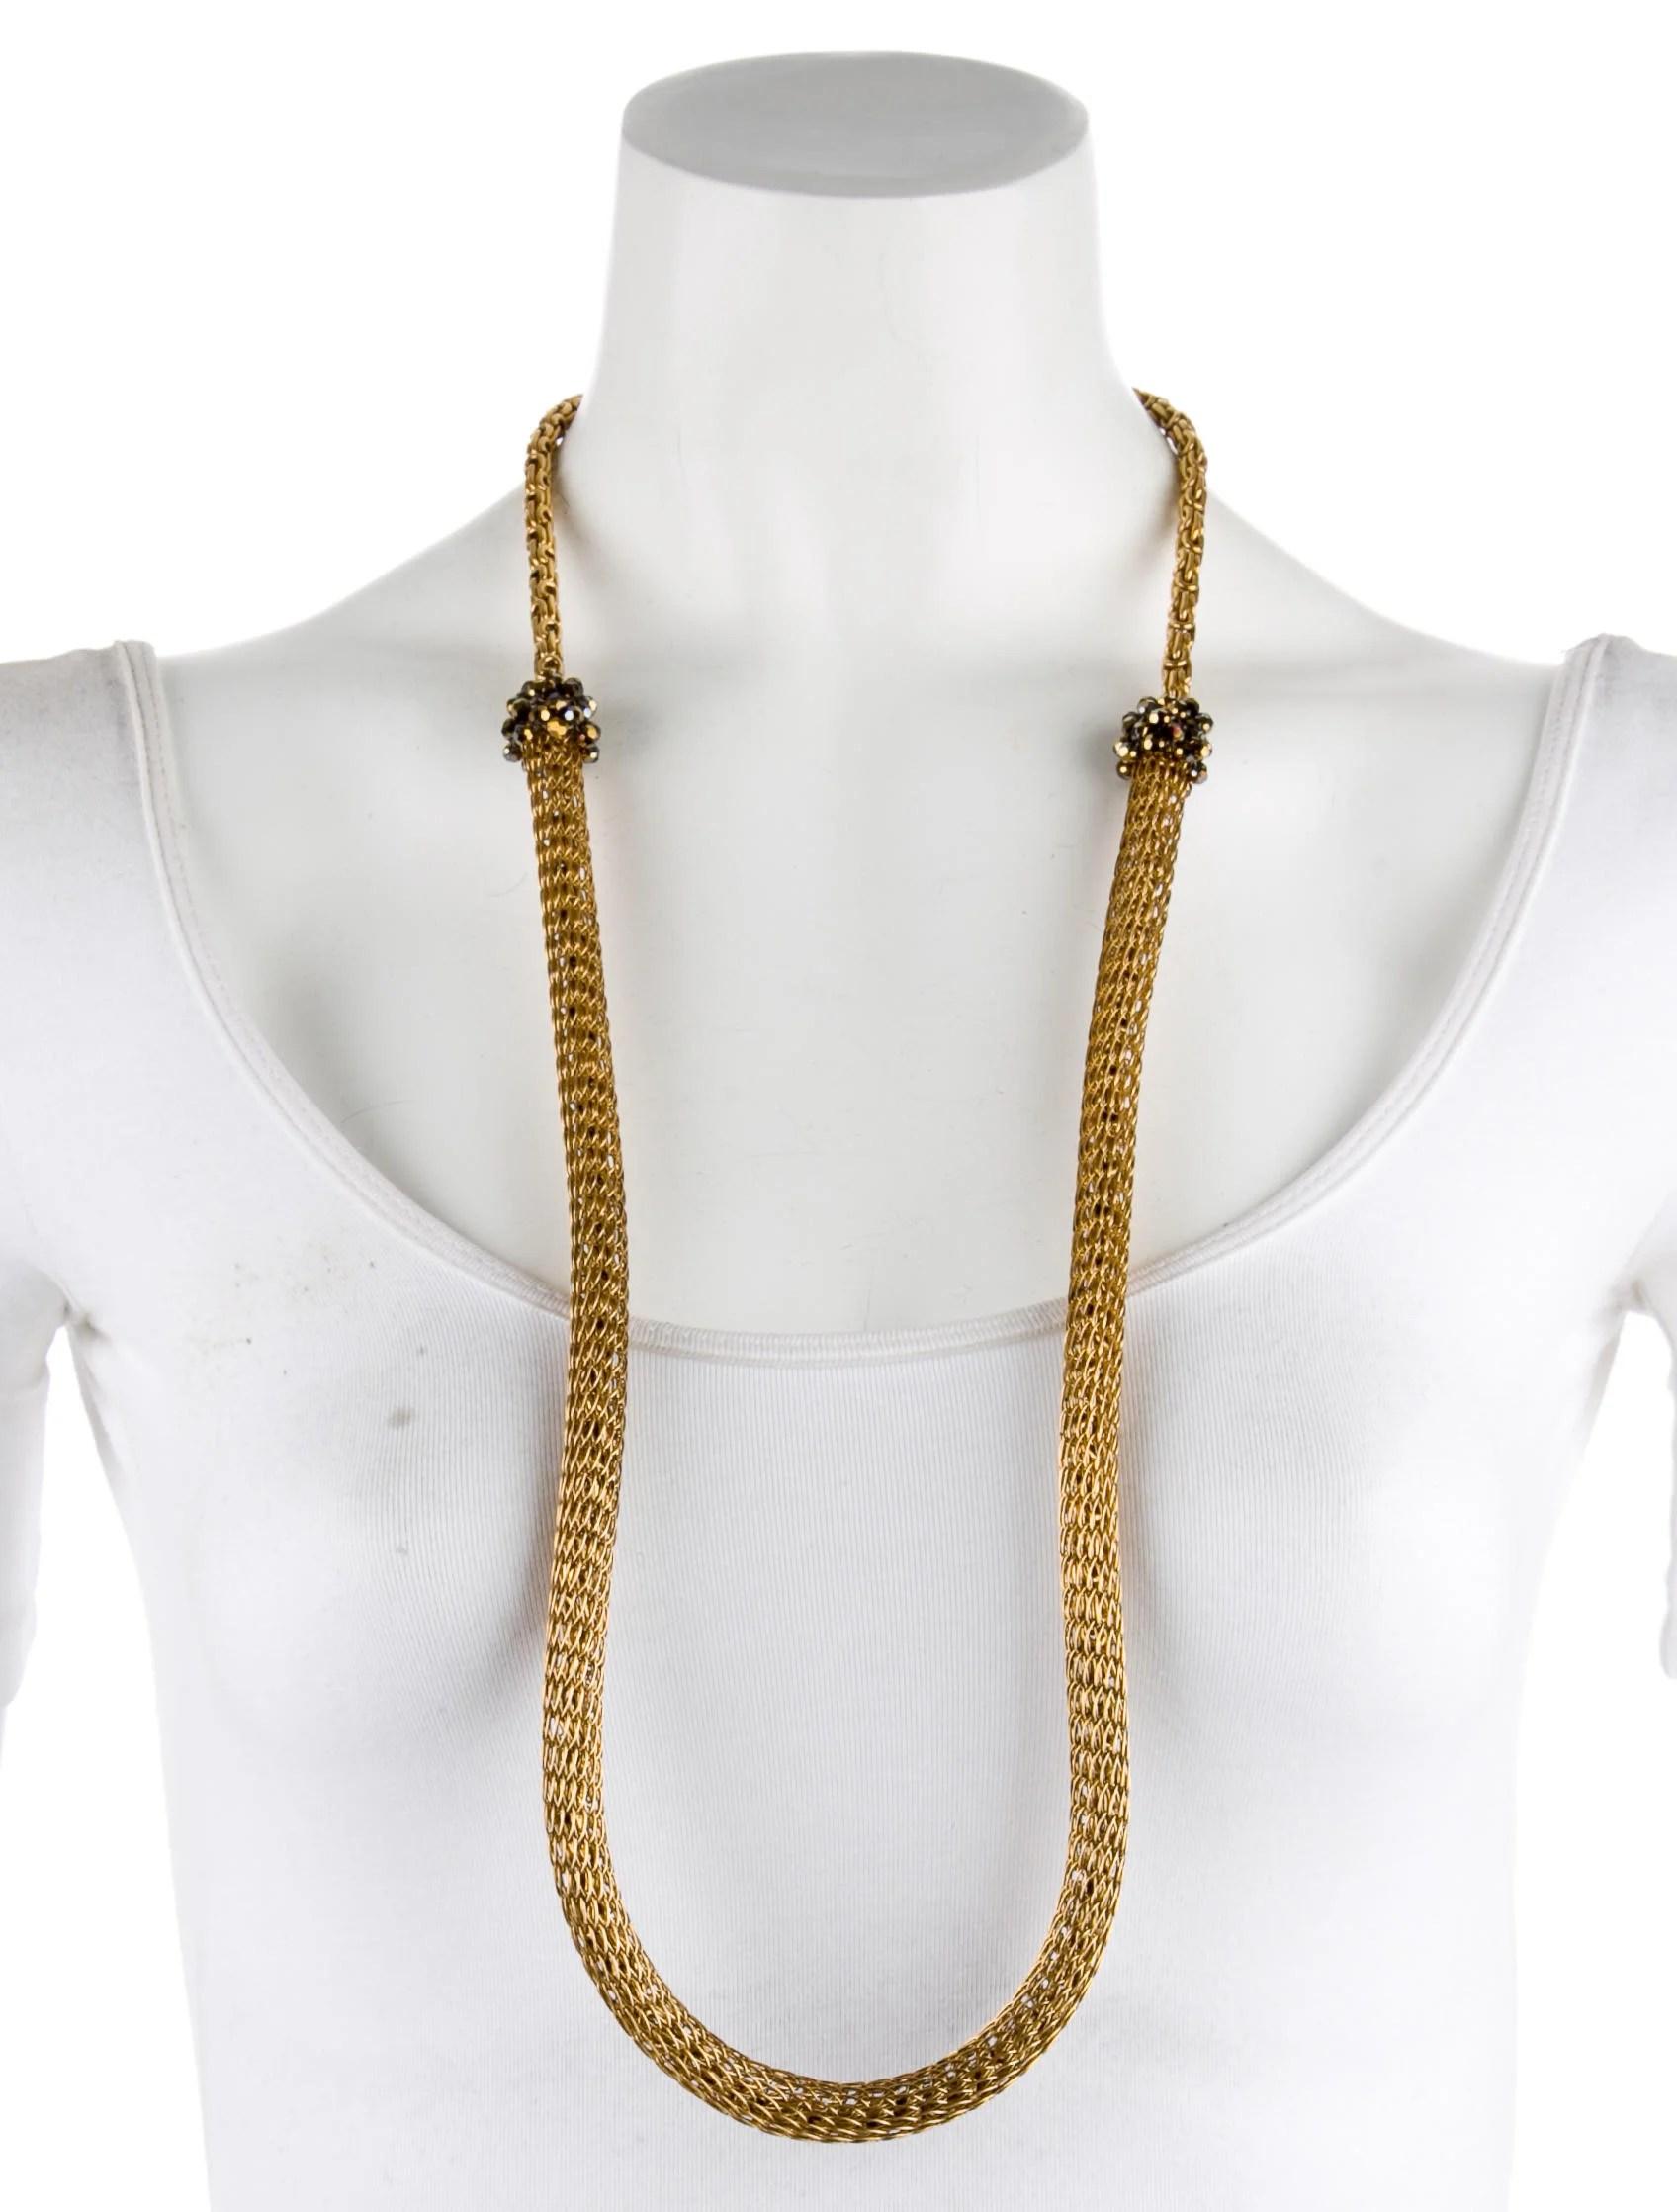 Erickson Beamon Bead Accent Woven Necklace Necklaces